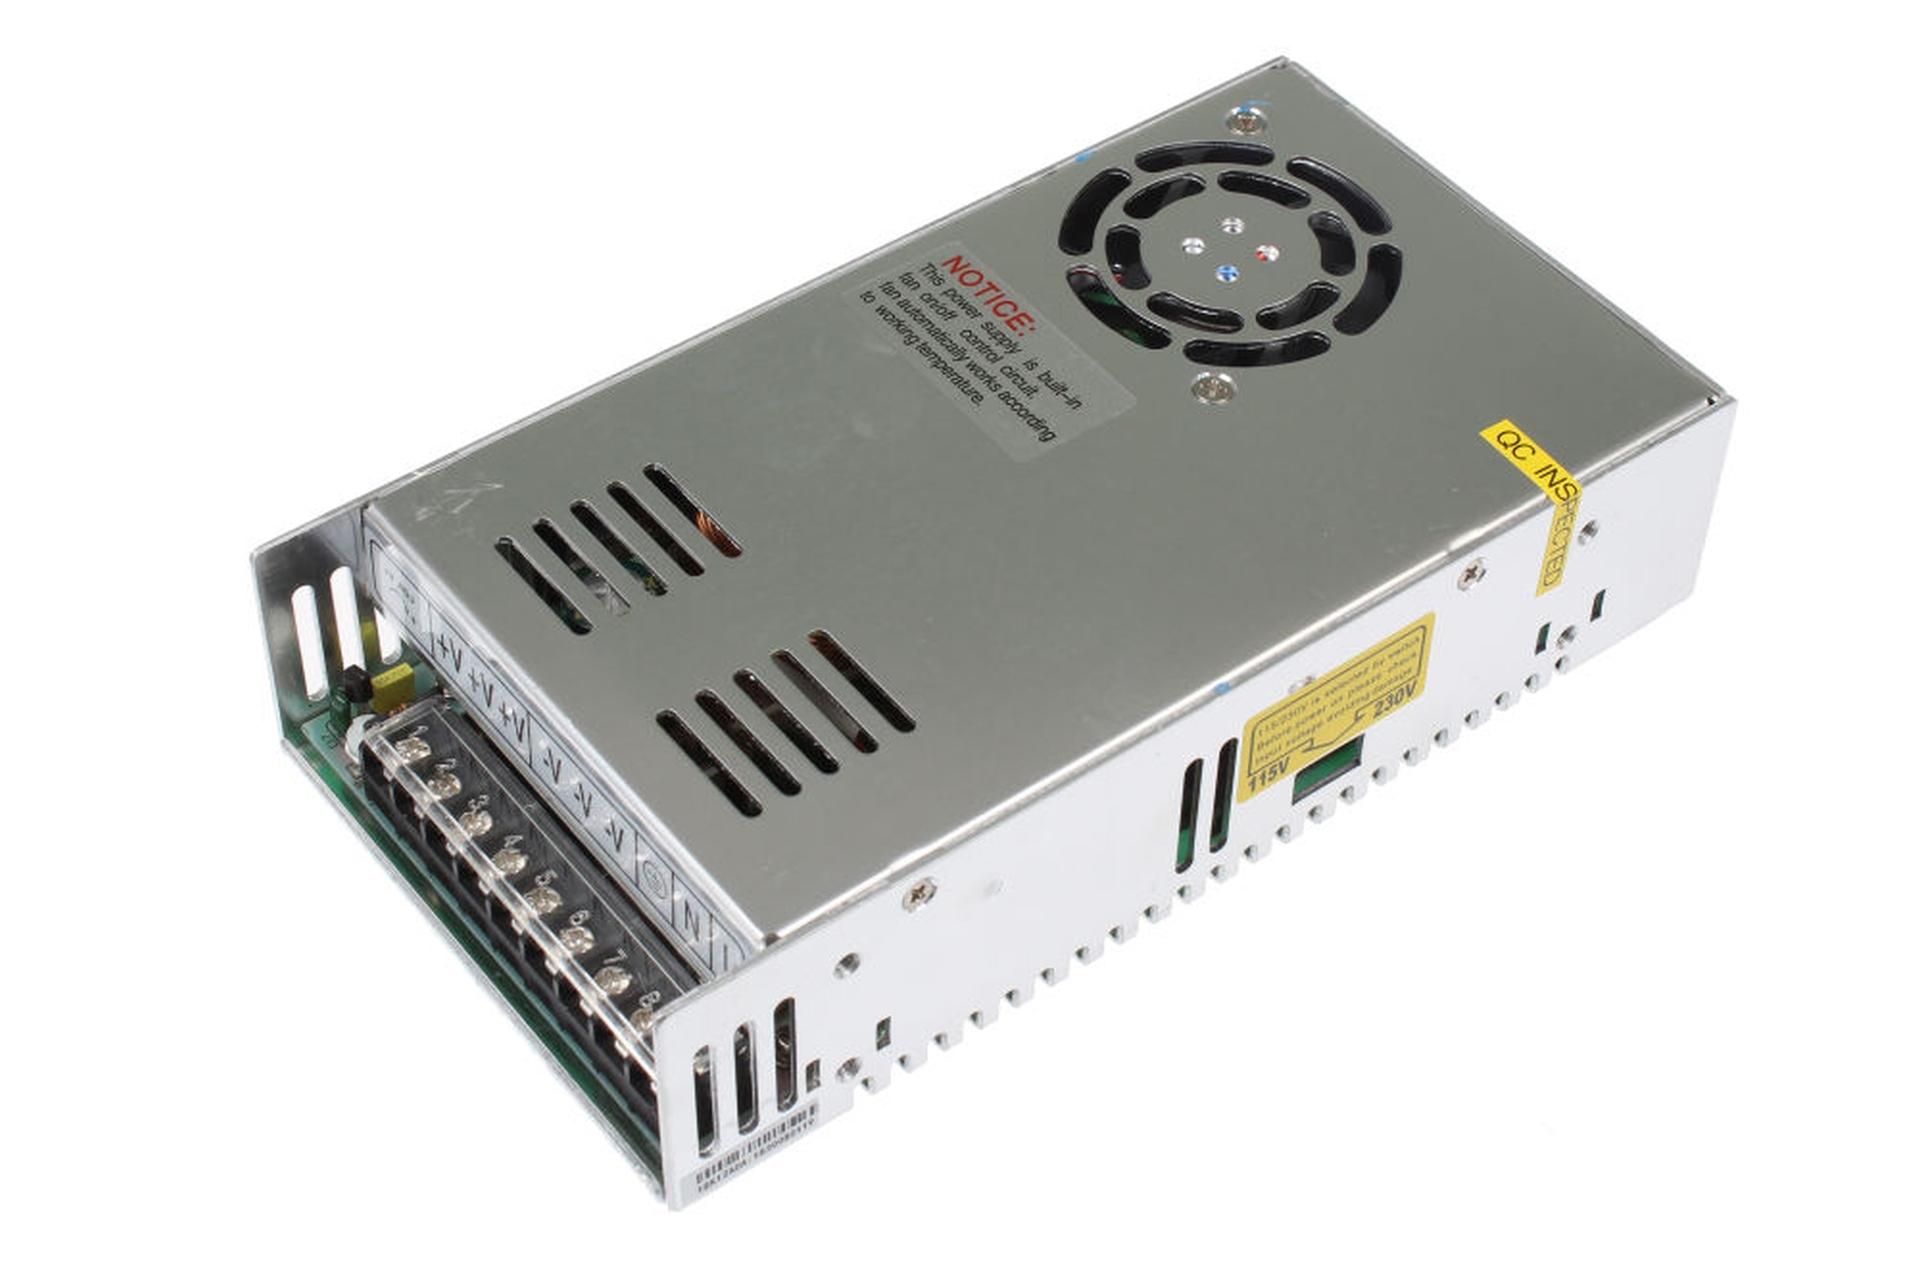 T-LED LED zdroj (trafo) 24V 480W - vnitřní 05527